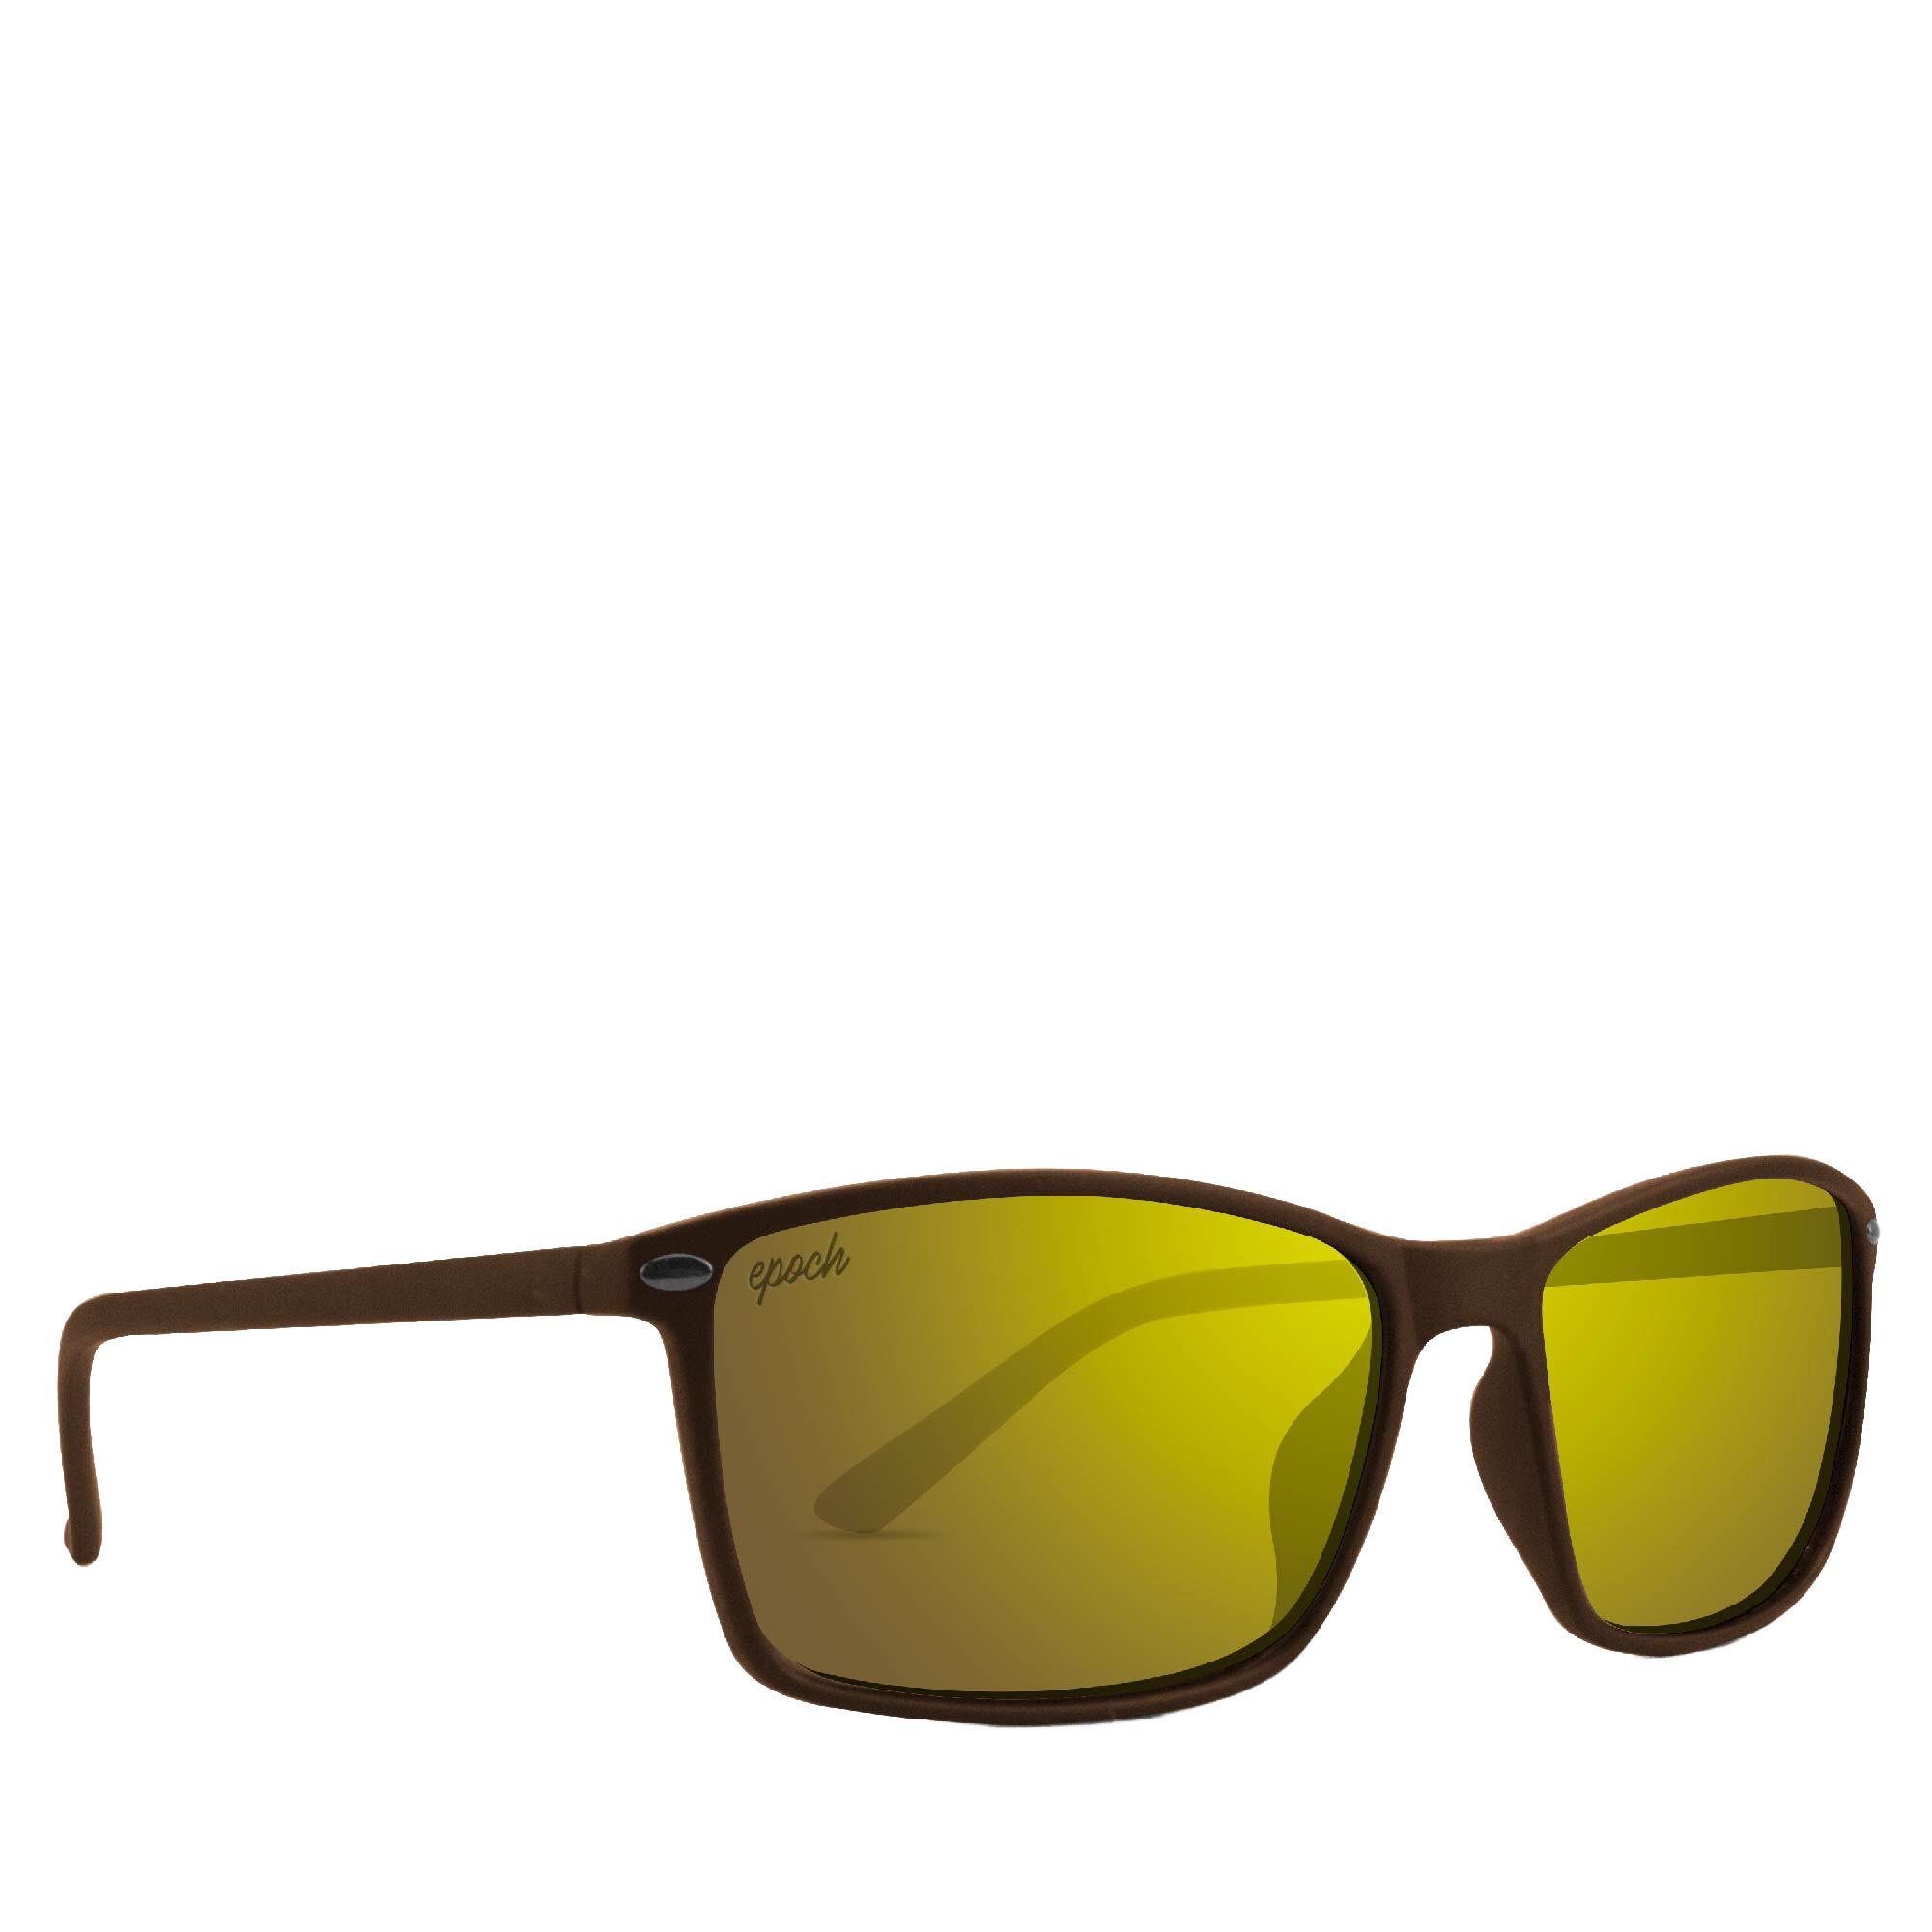 New Epoch Eyewear 11 Polycarbonate White Framed Sunglasses